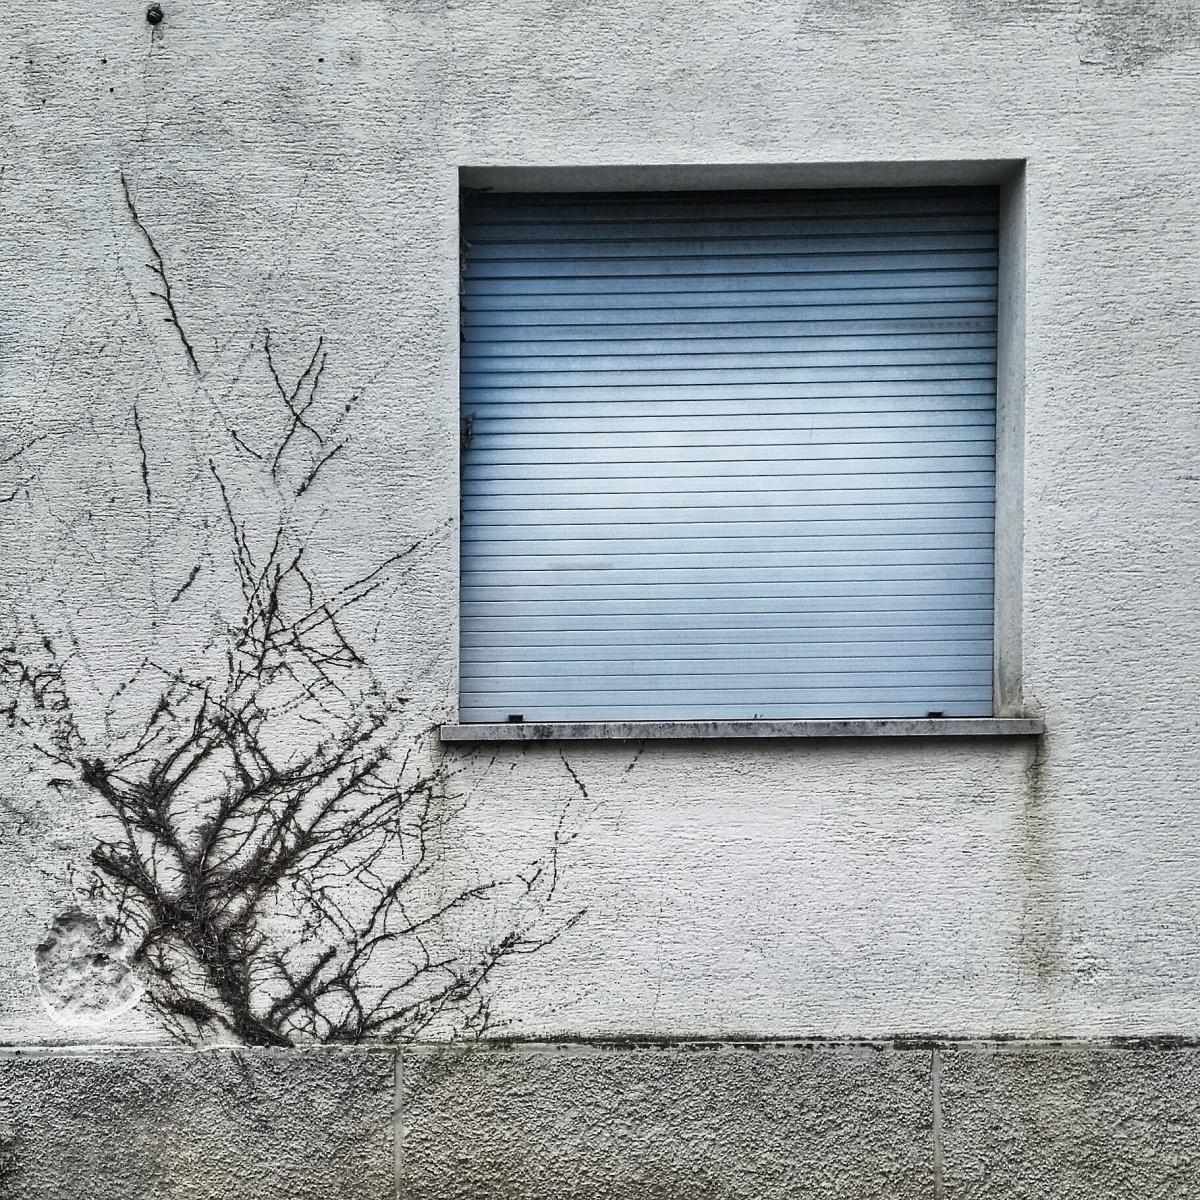 Residui d'inverno – Cividale del Friuli (UD)